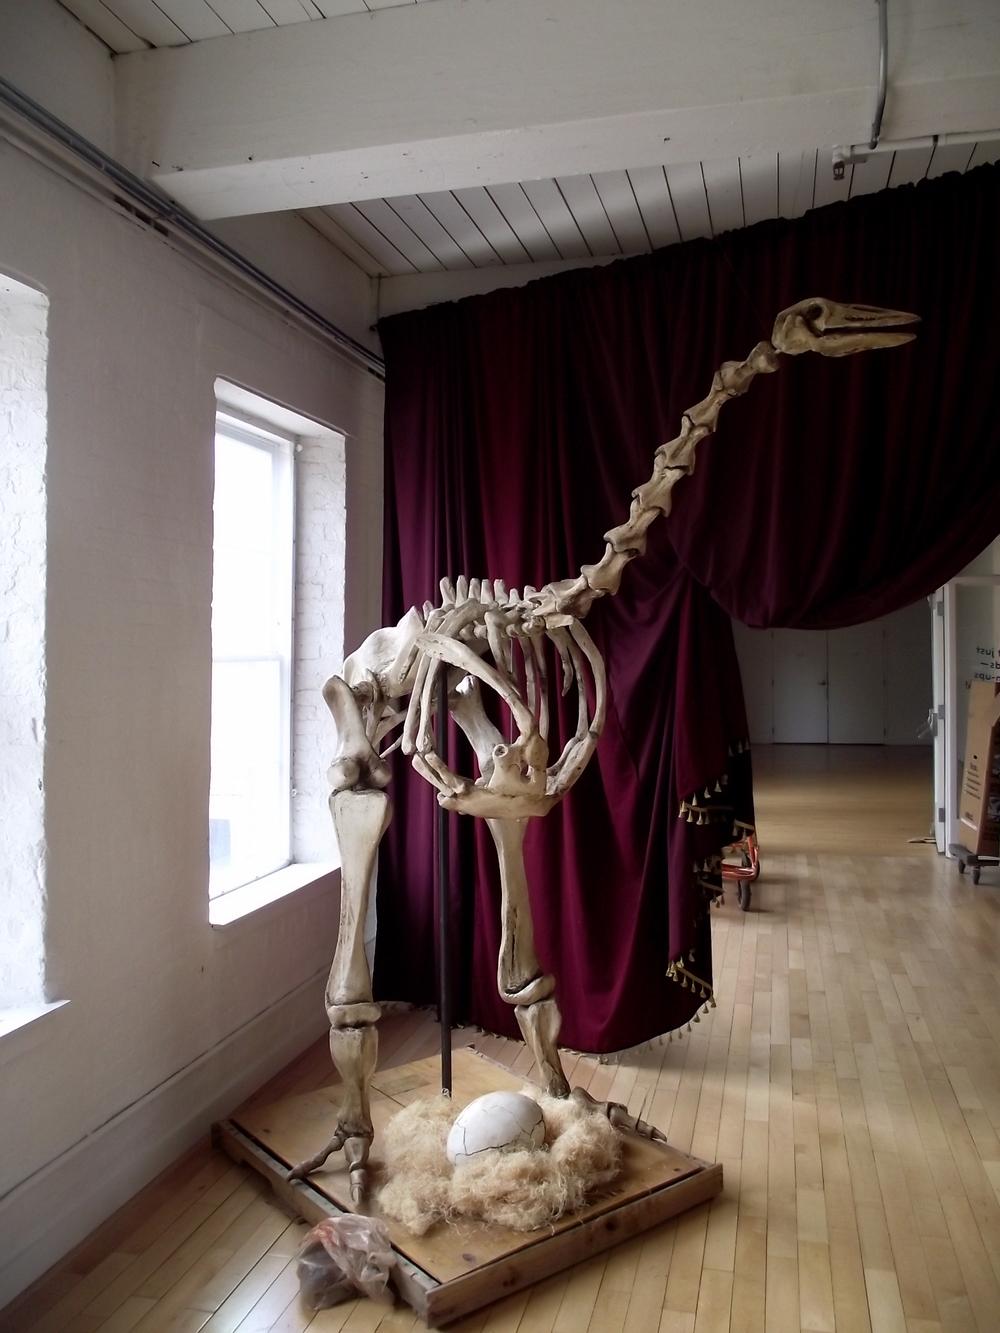 Resurrecting the Elephant Bird, 2007. Mass MoCA 2012